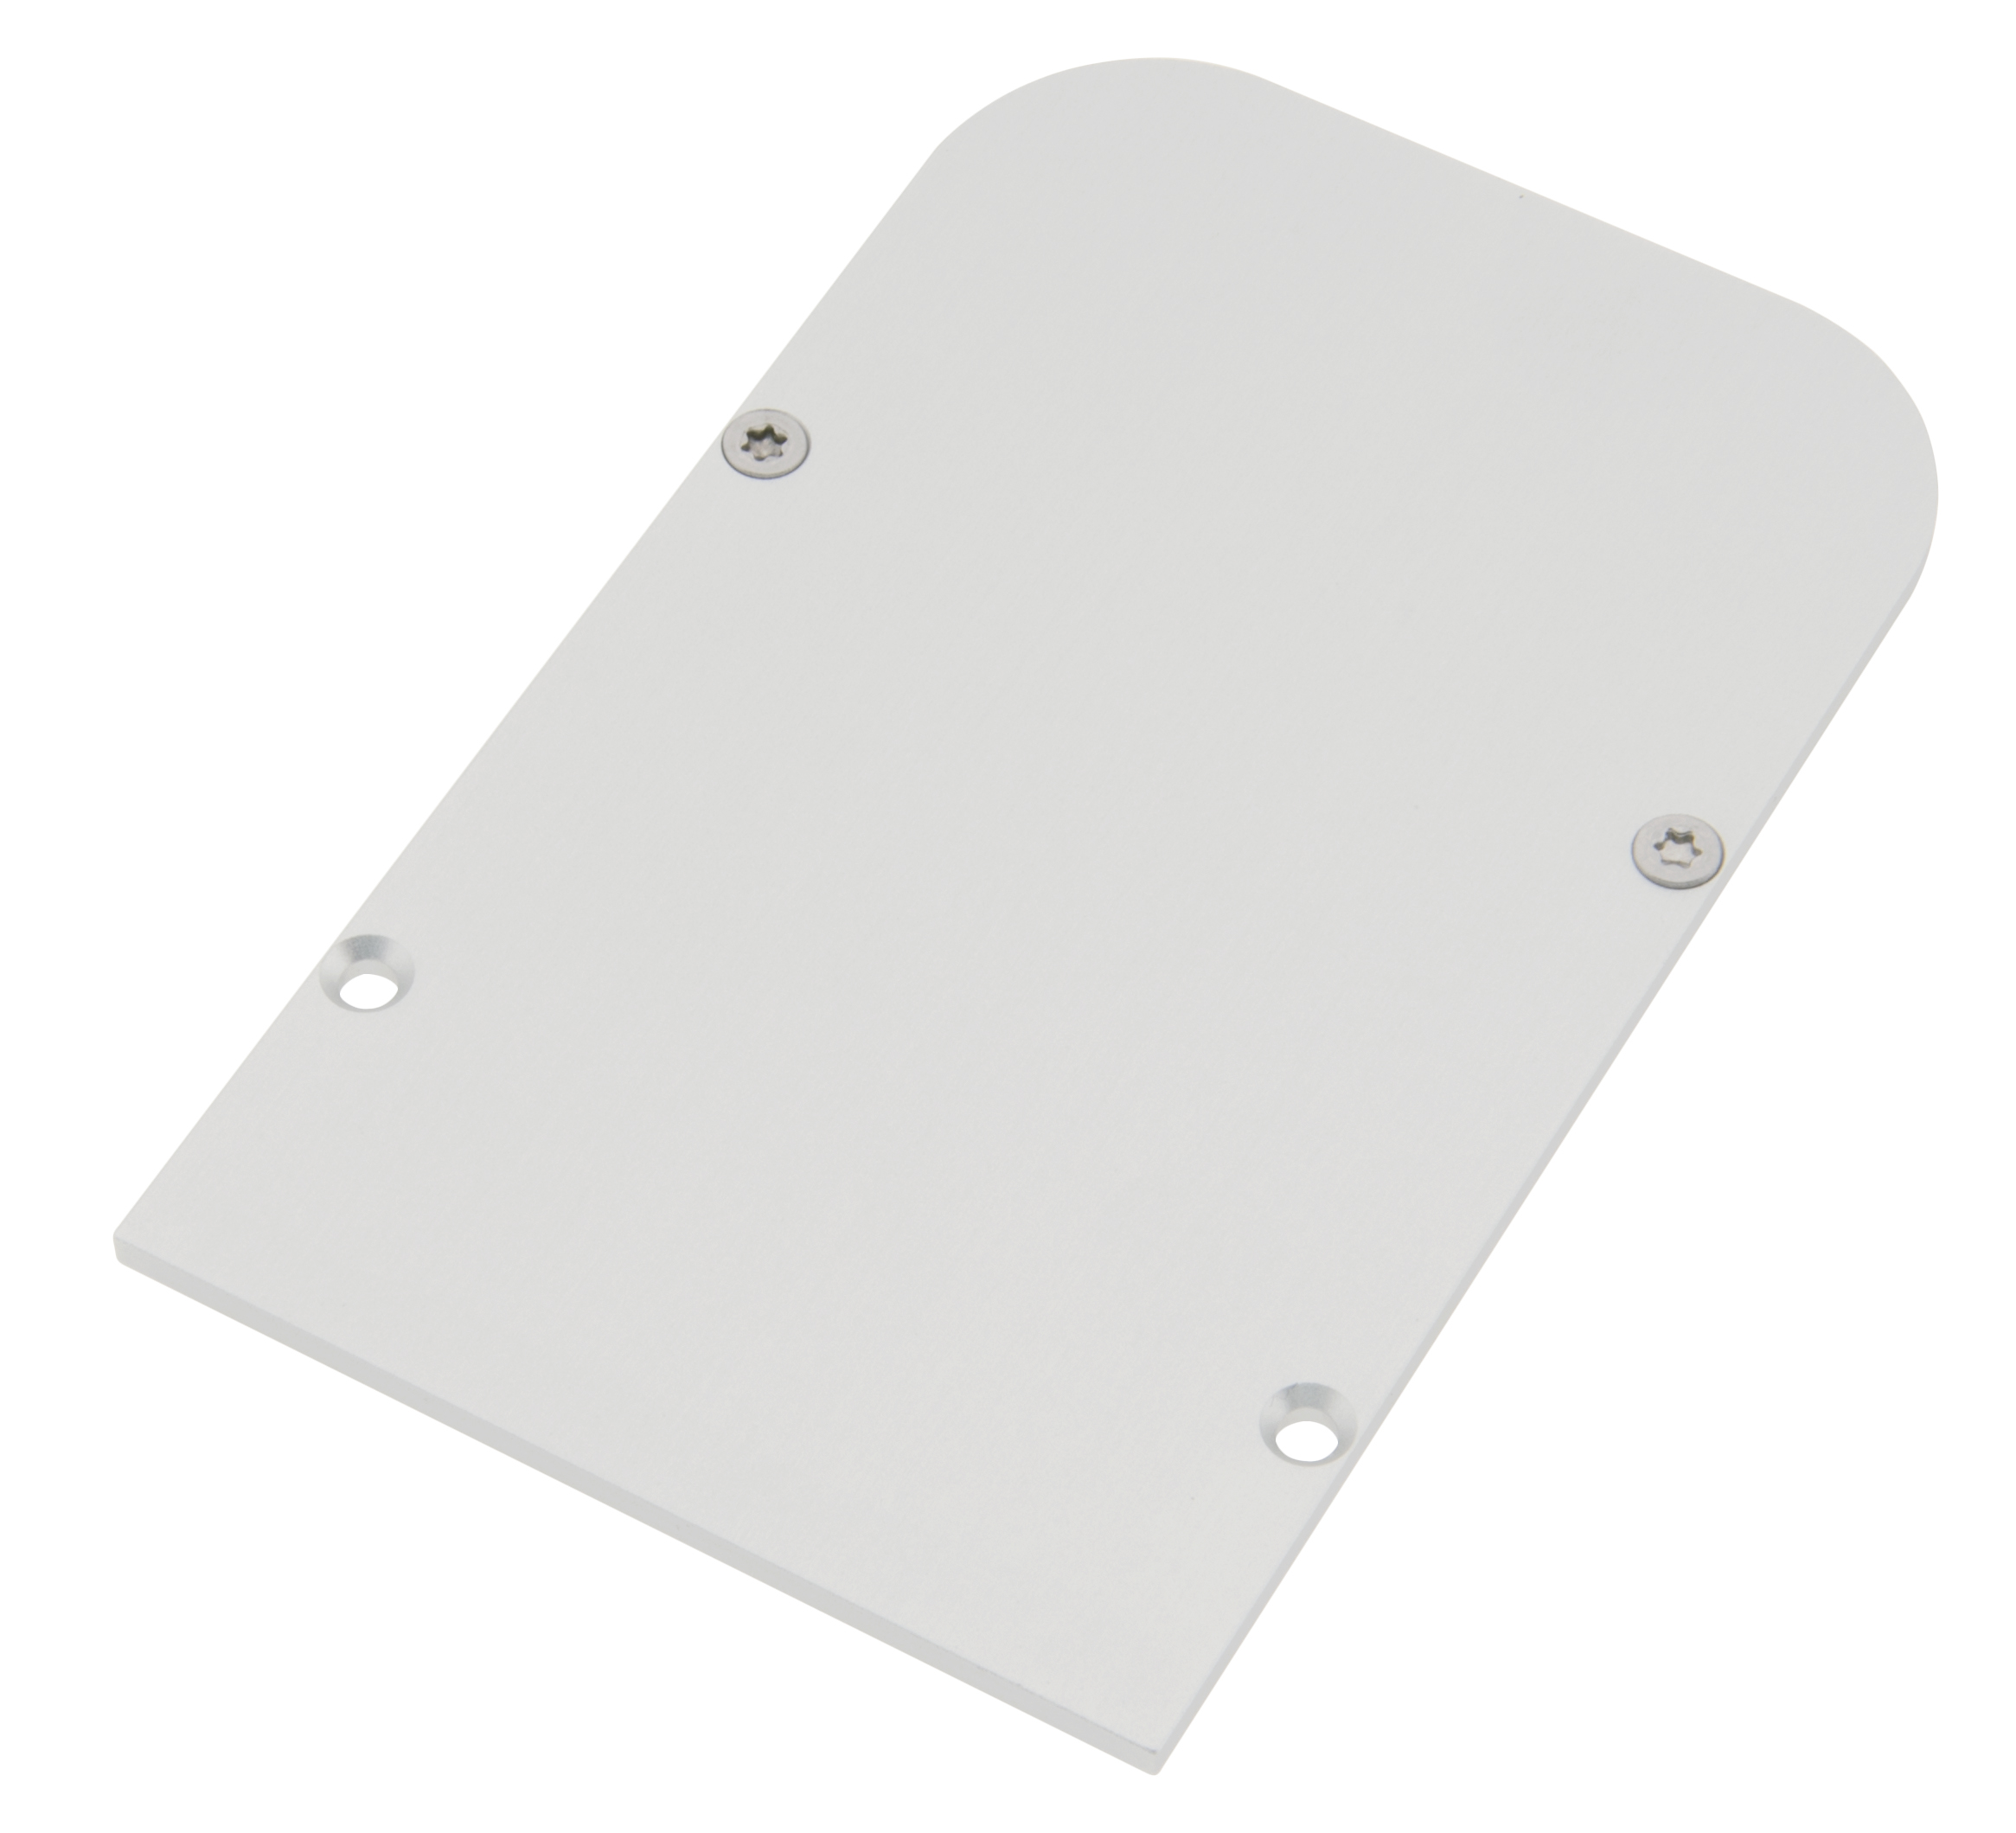 1 Stk Profil Endkappe SLH Rund geschlossen inkl. Schrauben LIEK003410